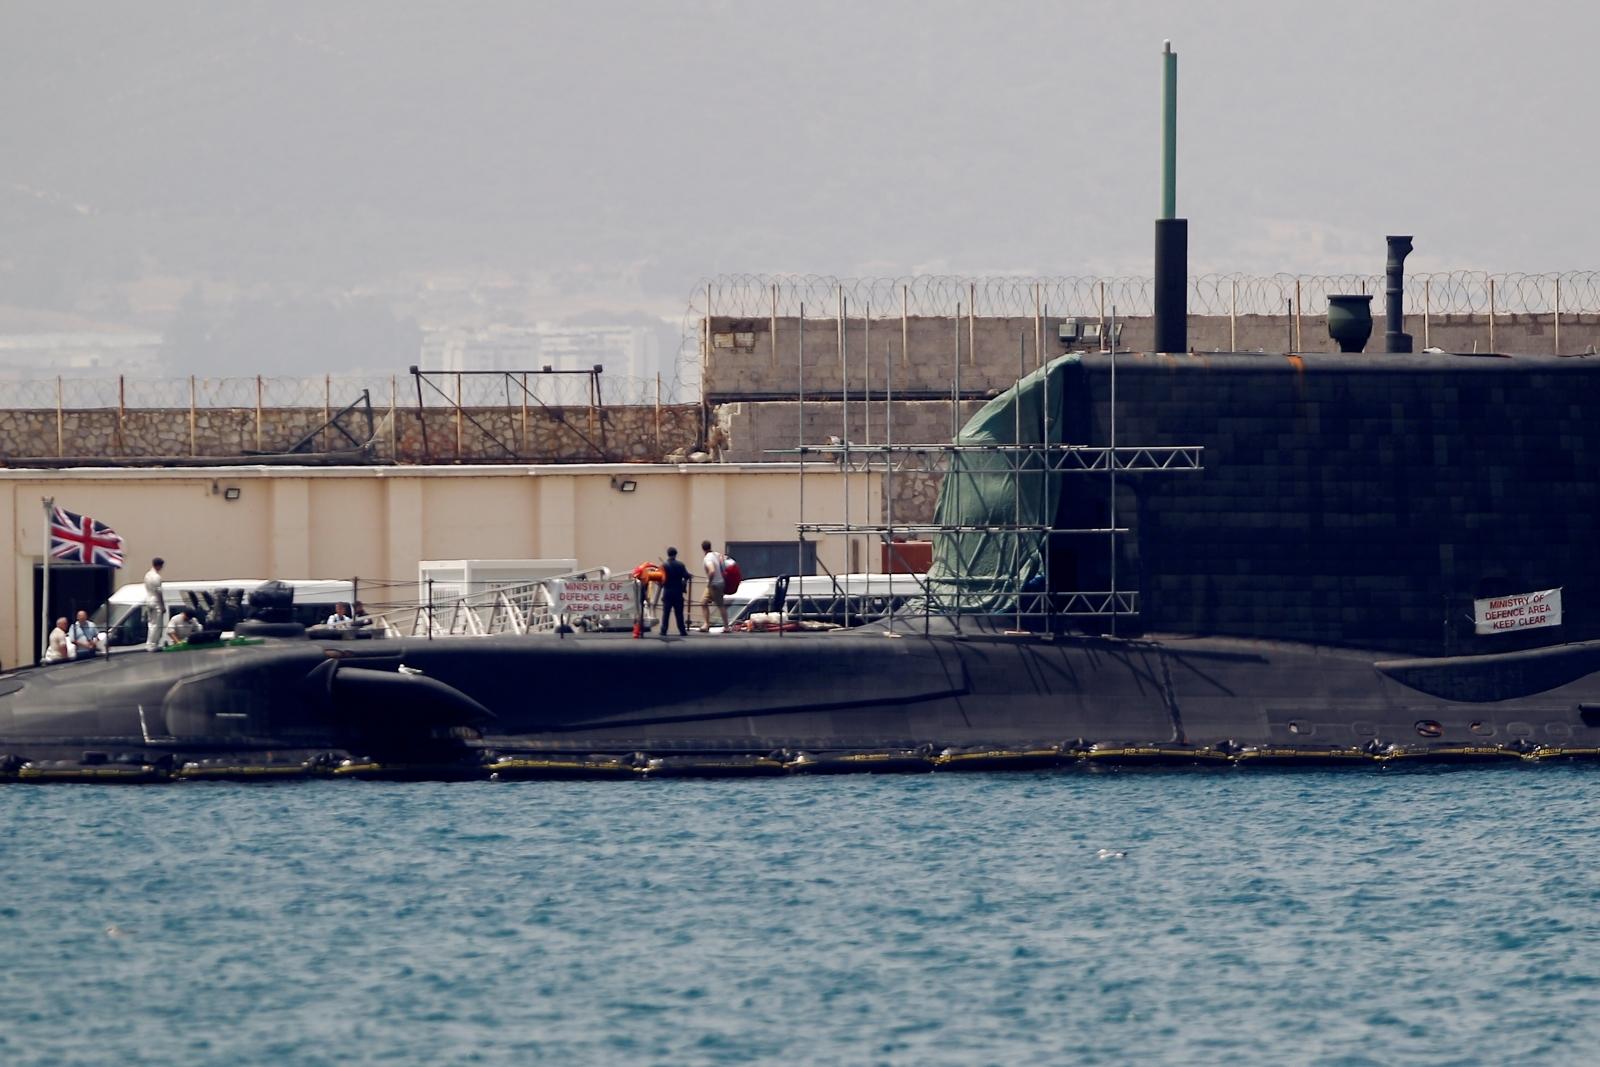 Submarine commander admits damaging £1.1billion Cumbrian-built HMS Ambush